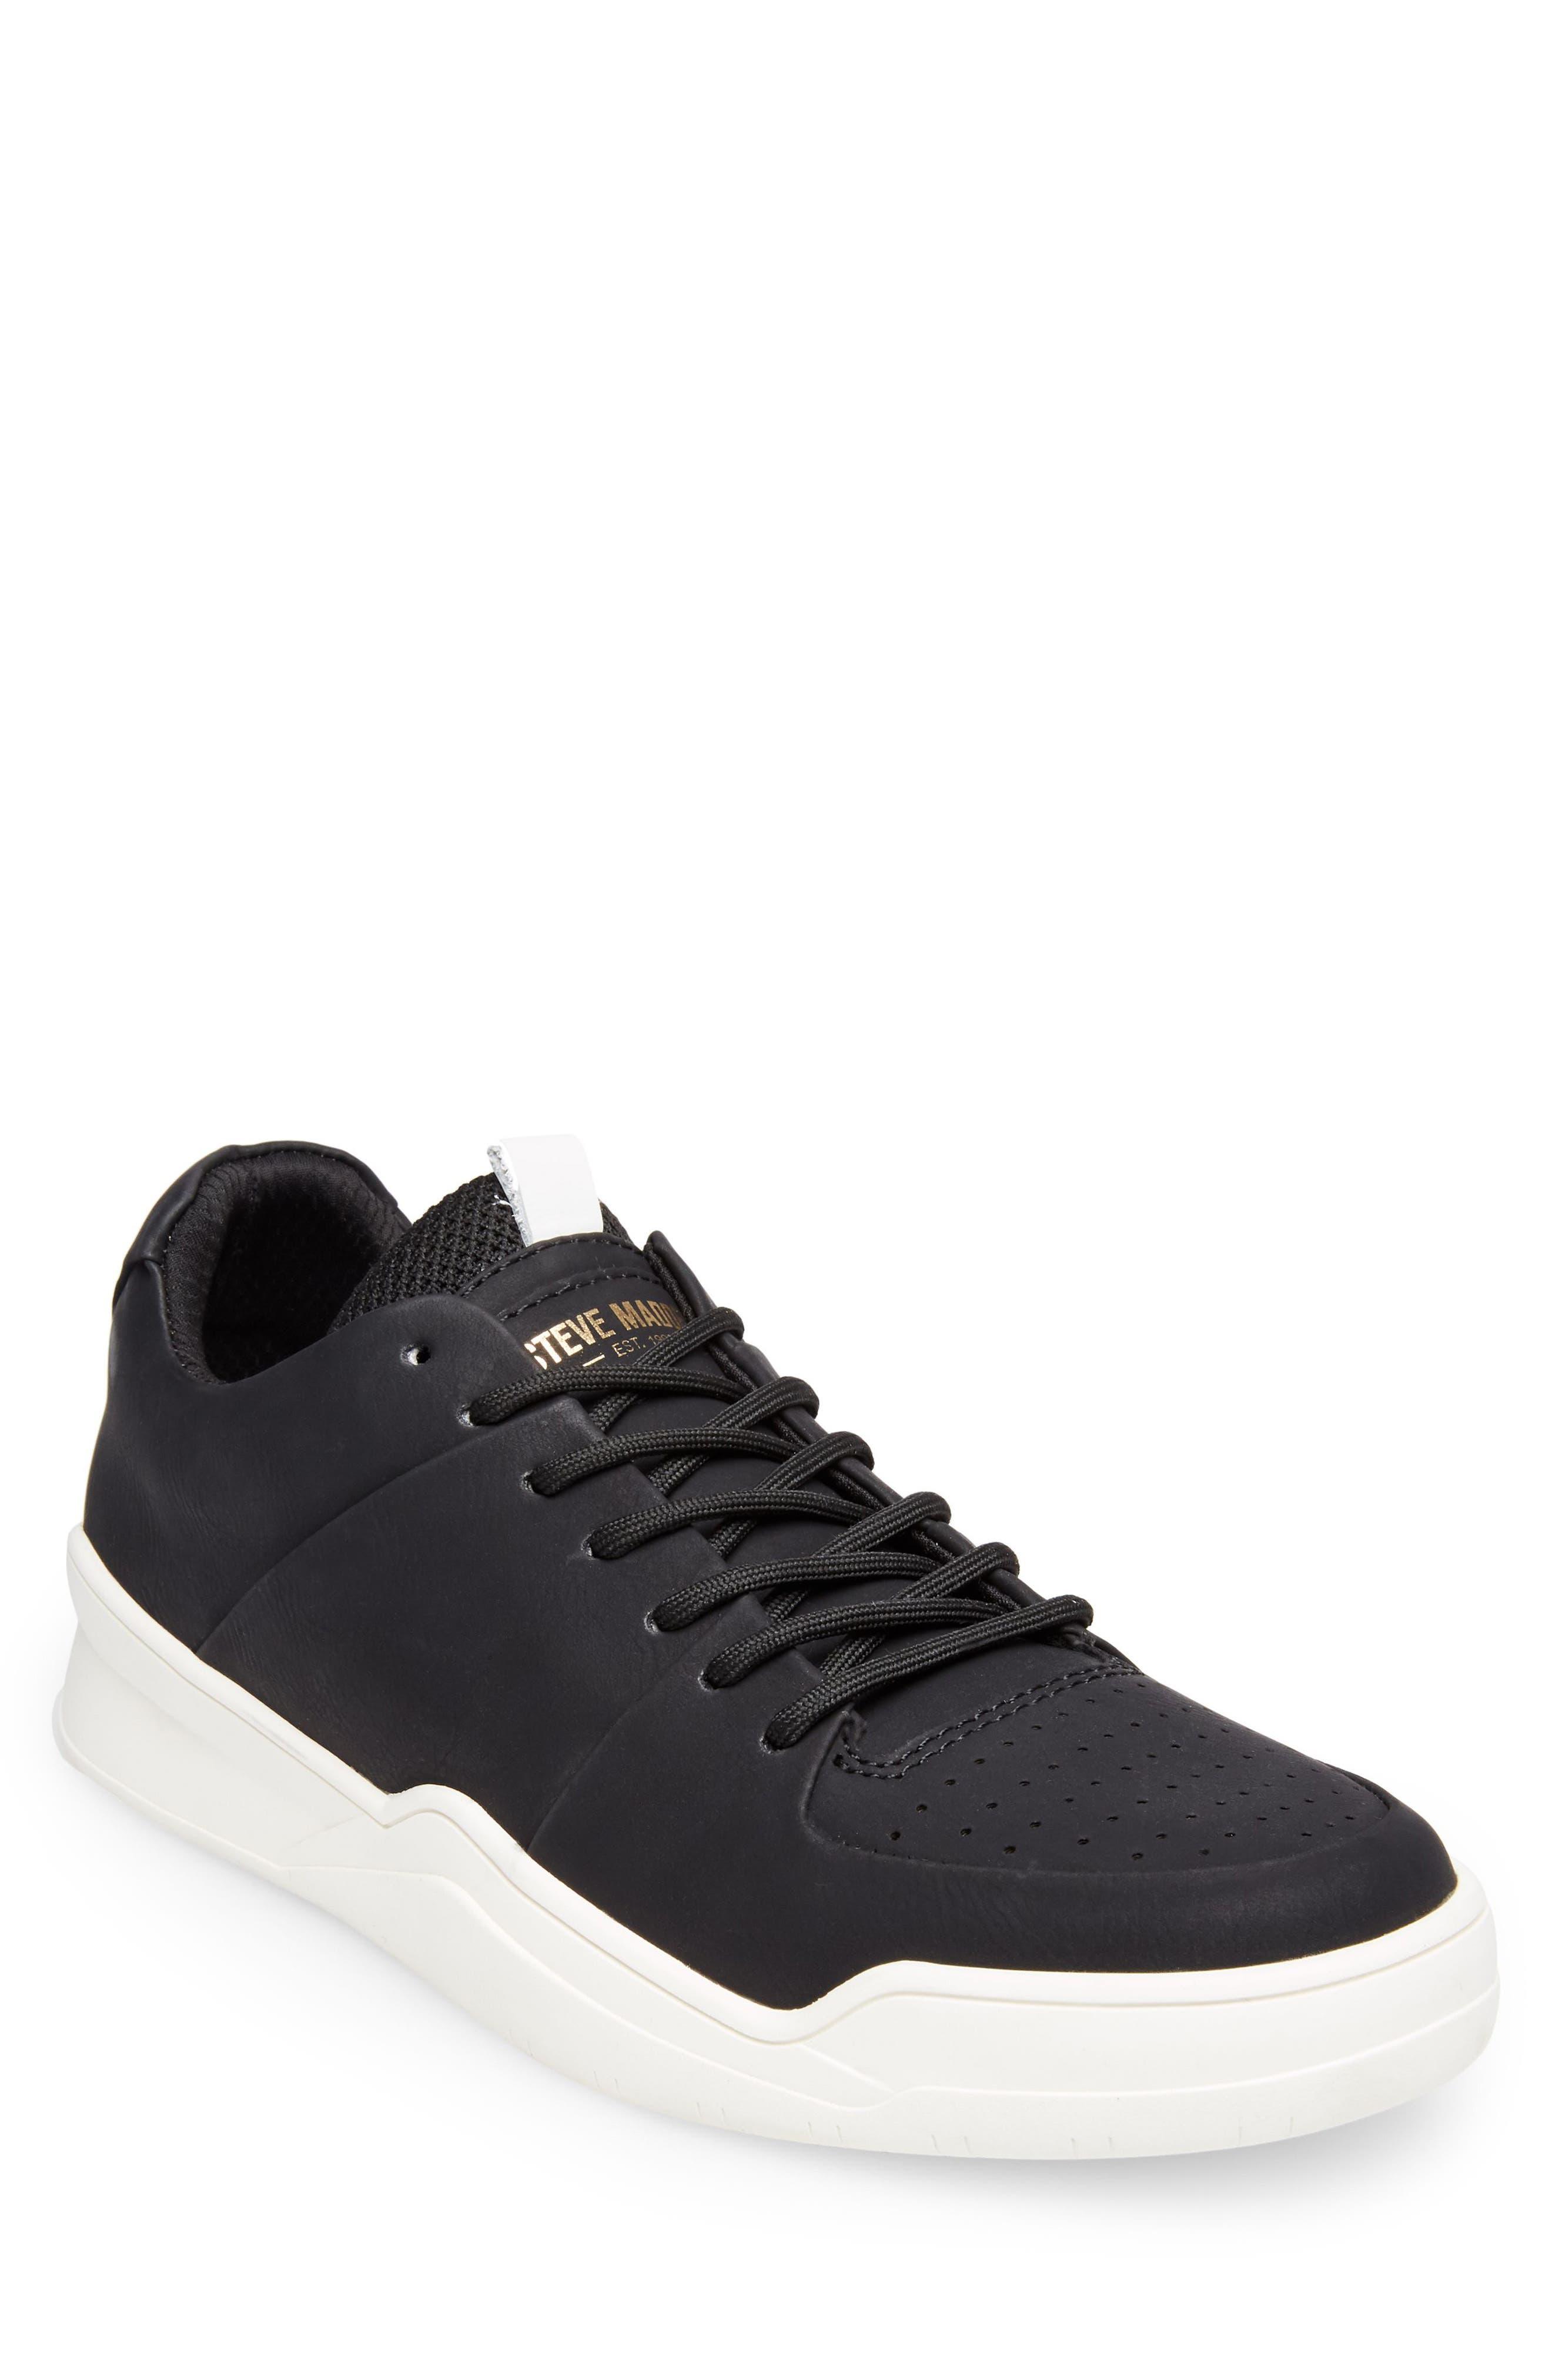 Vantage Sneaker,                             Main thumbnail 1, color,                             001